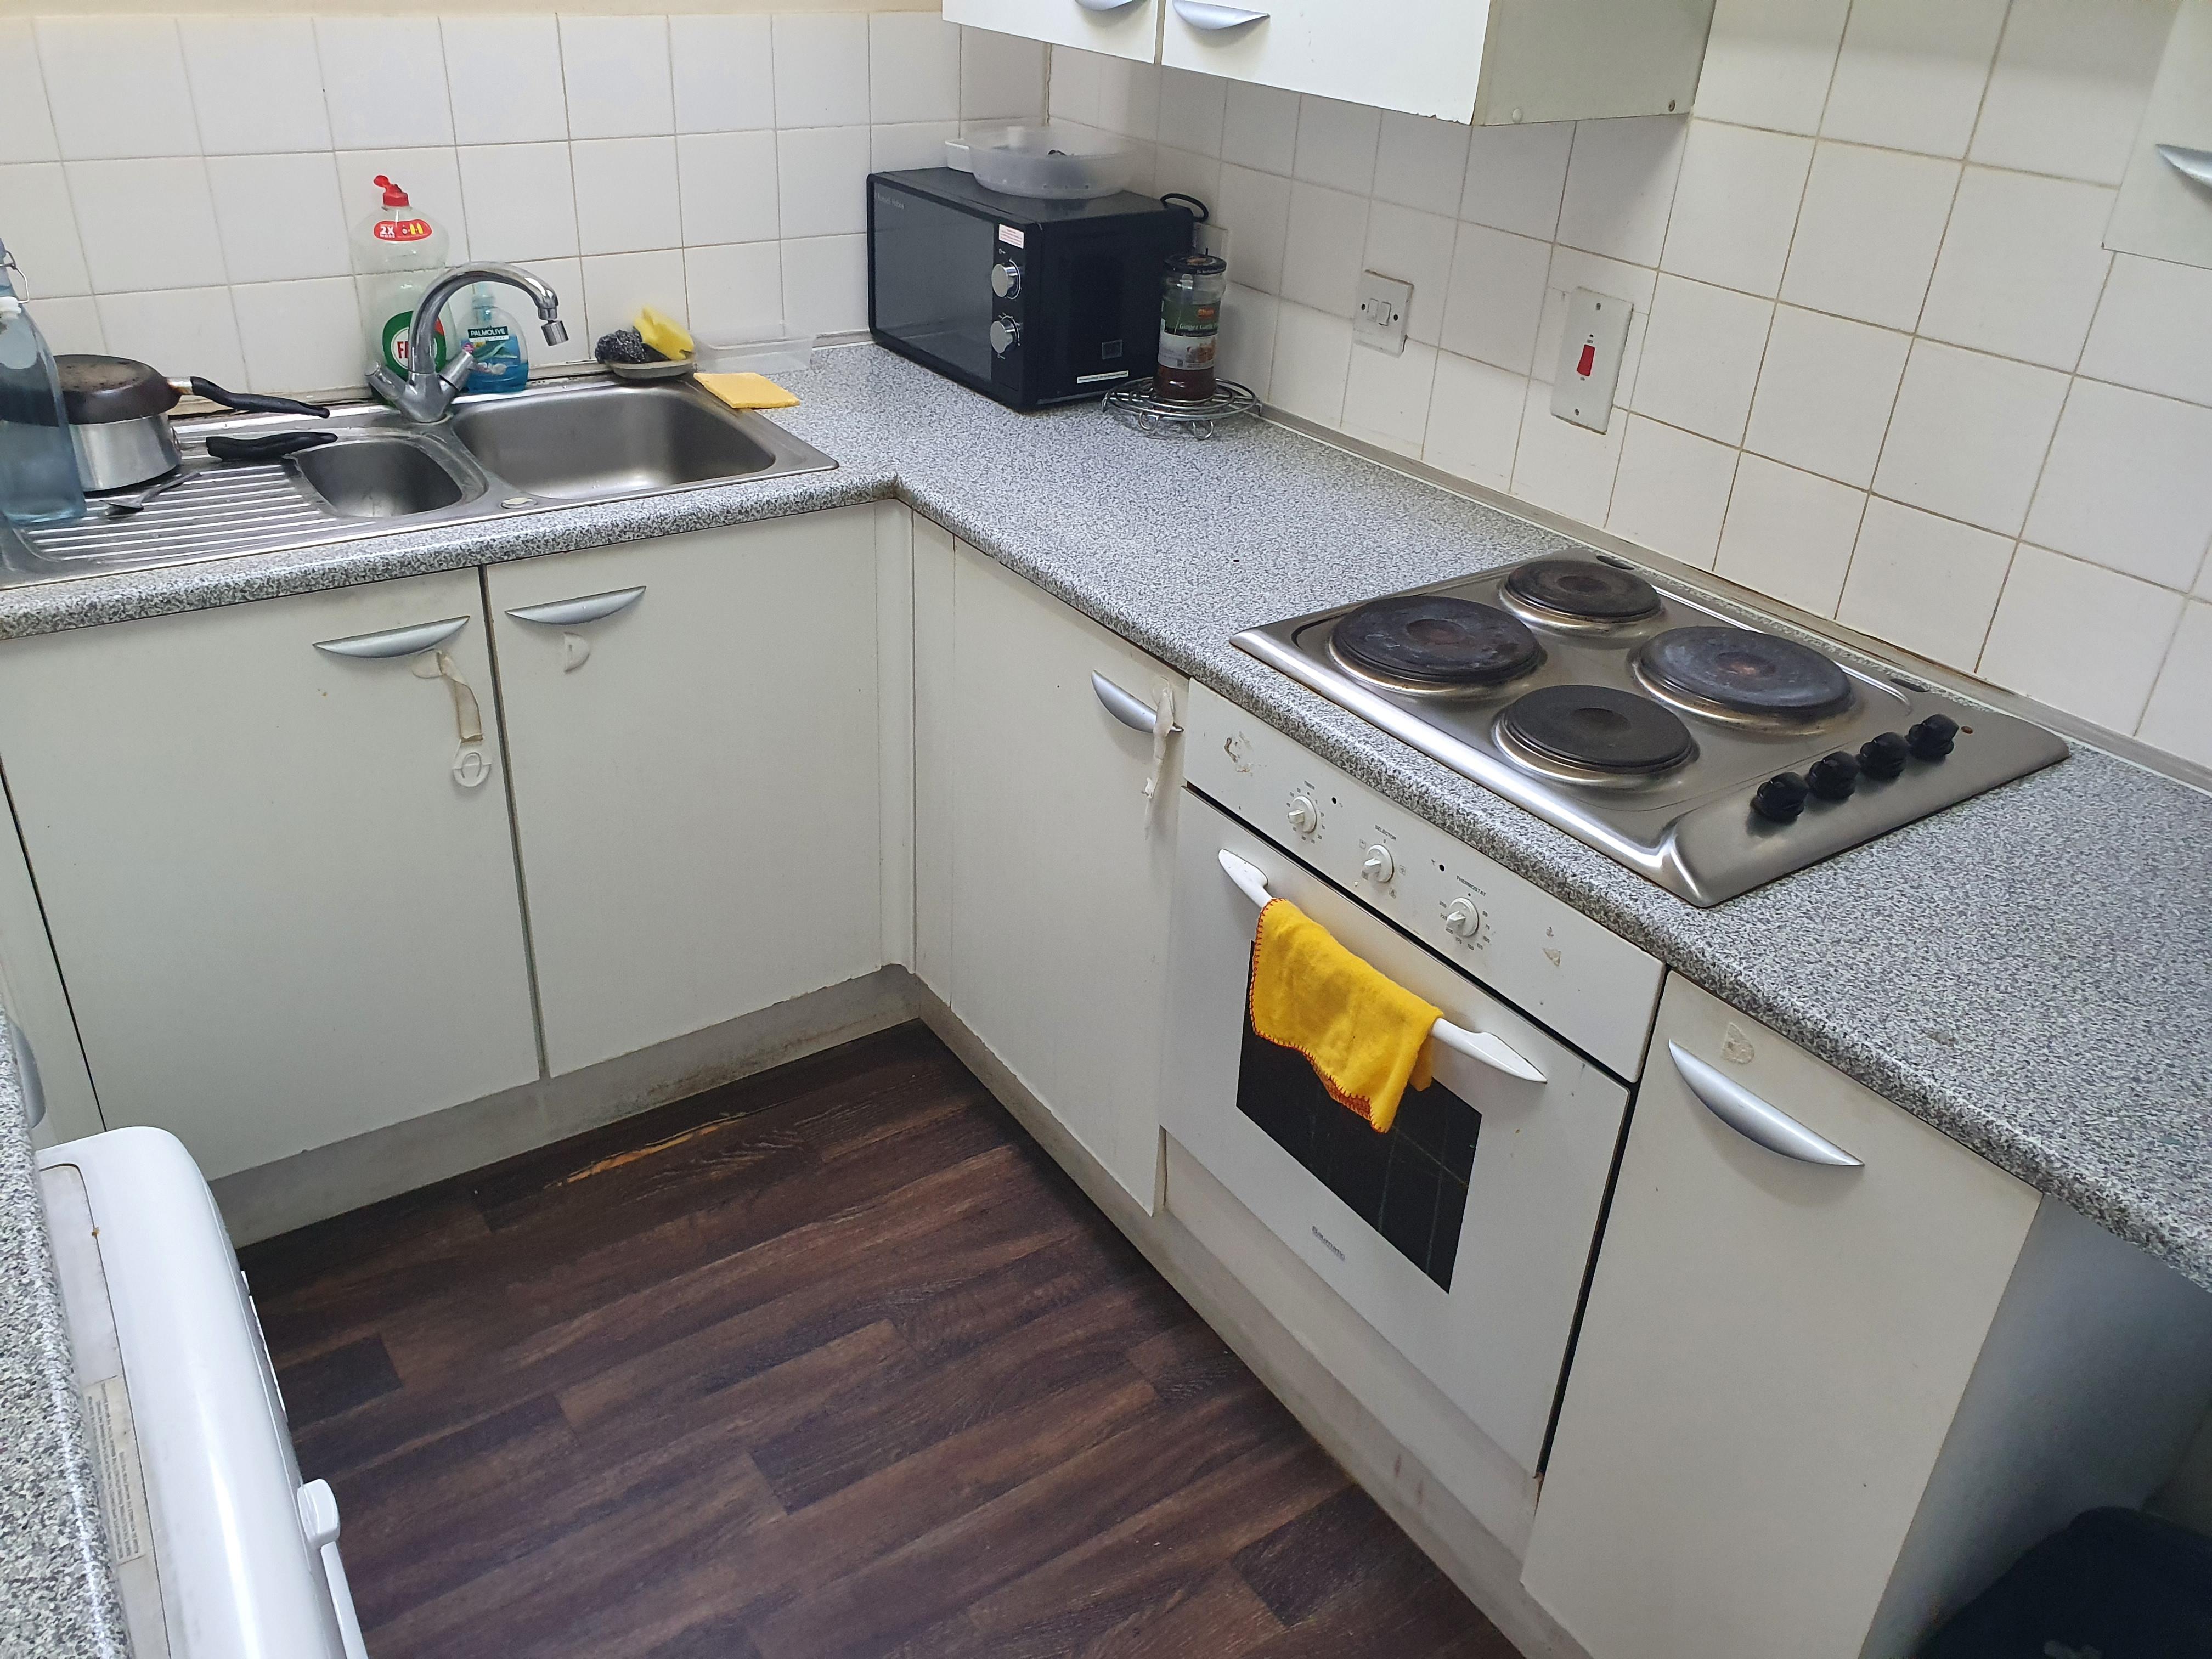 customer_1/branch_3/client_40744/sale_property/kitchen_1619438883.jpeg